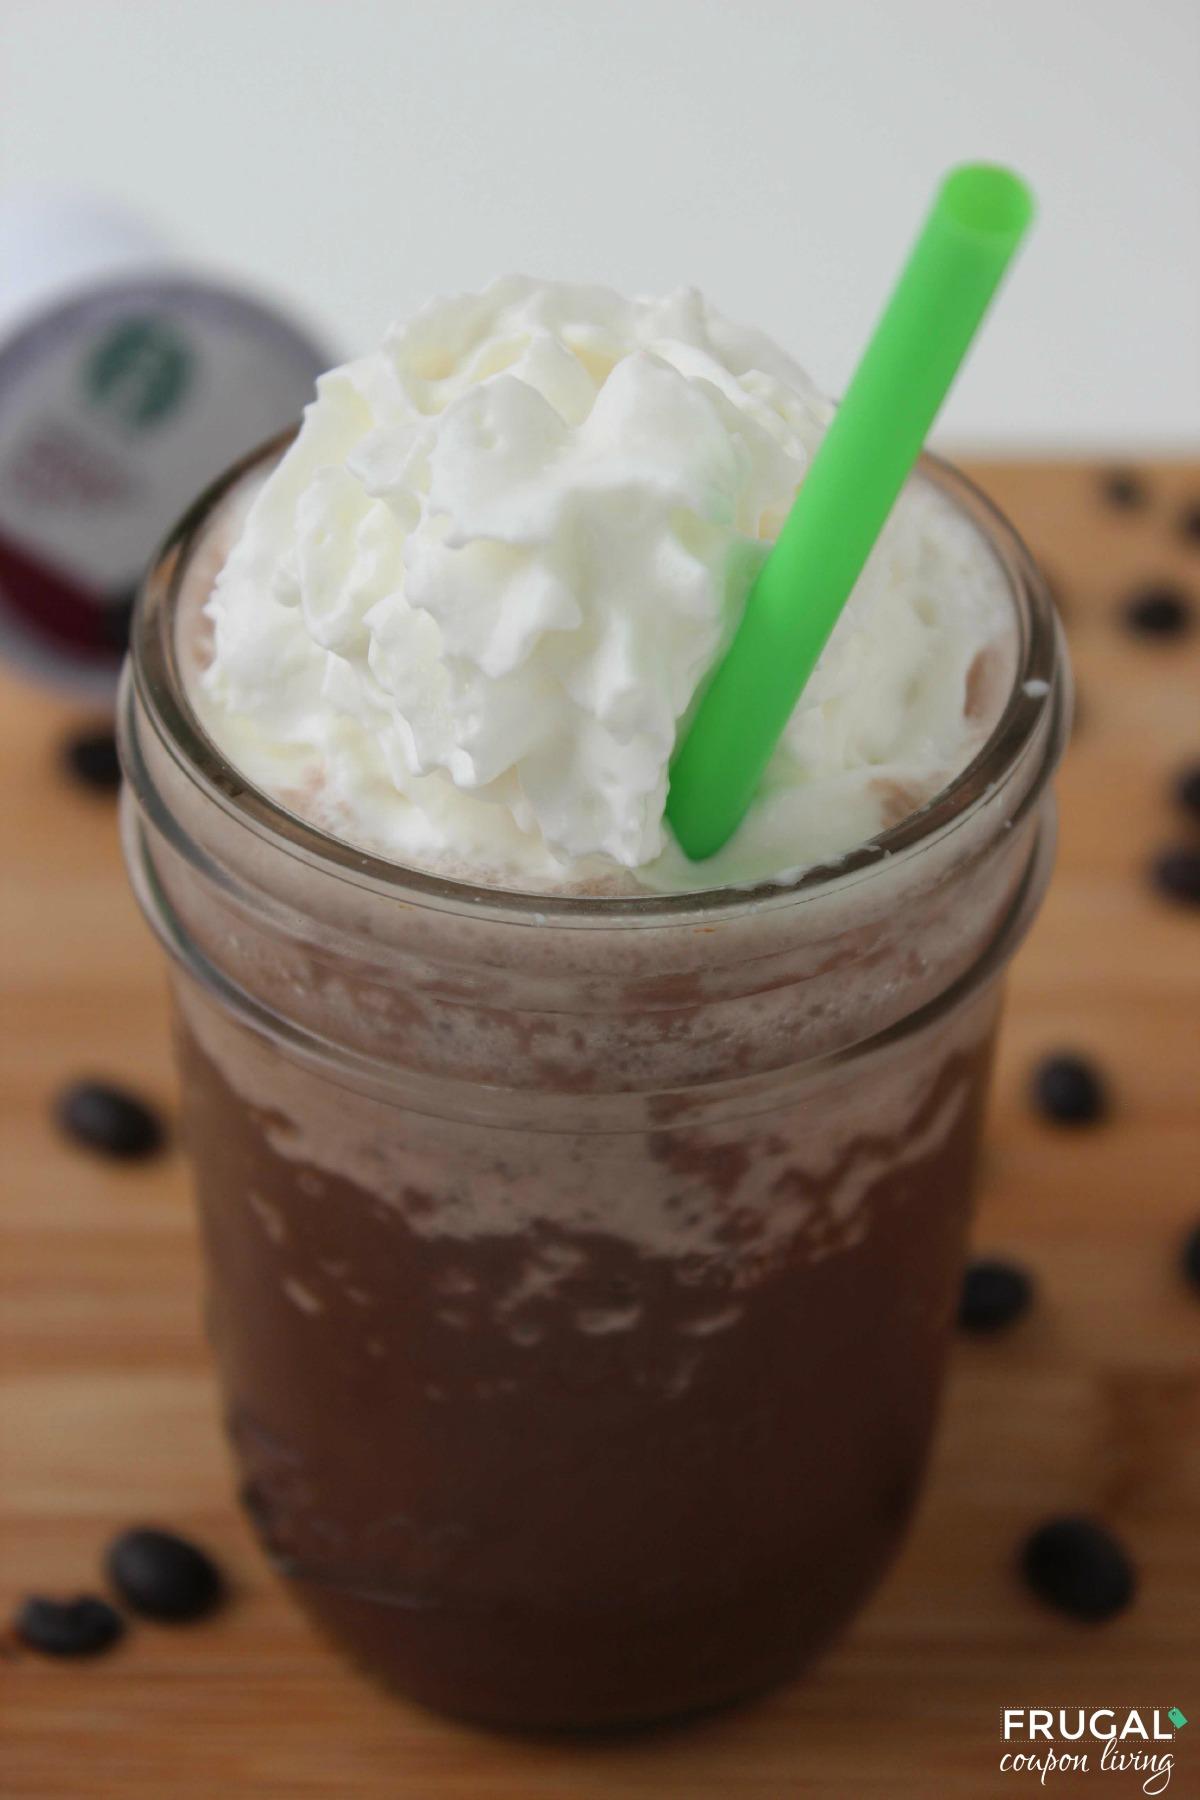 Copycat-Starbucks-Mocha-Frappuccino-frugal-coupon-living-smaller